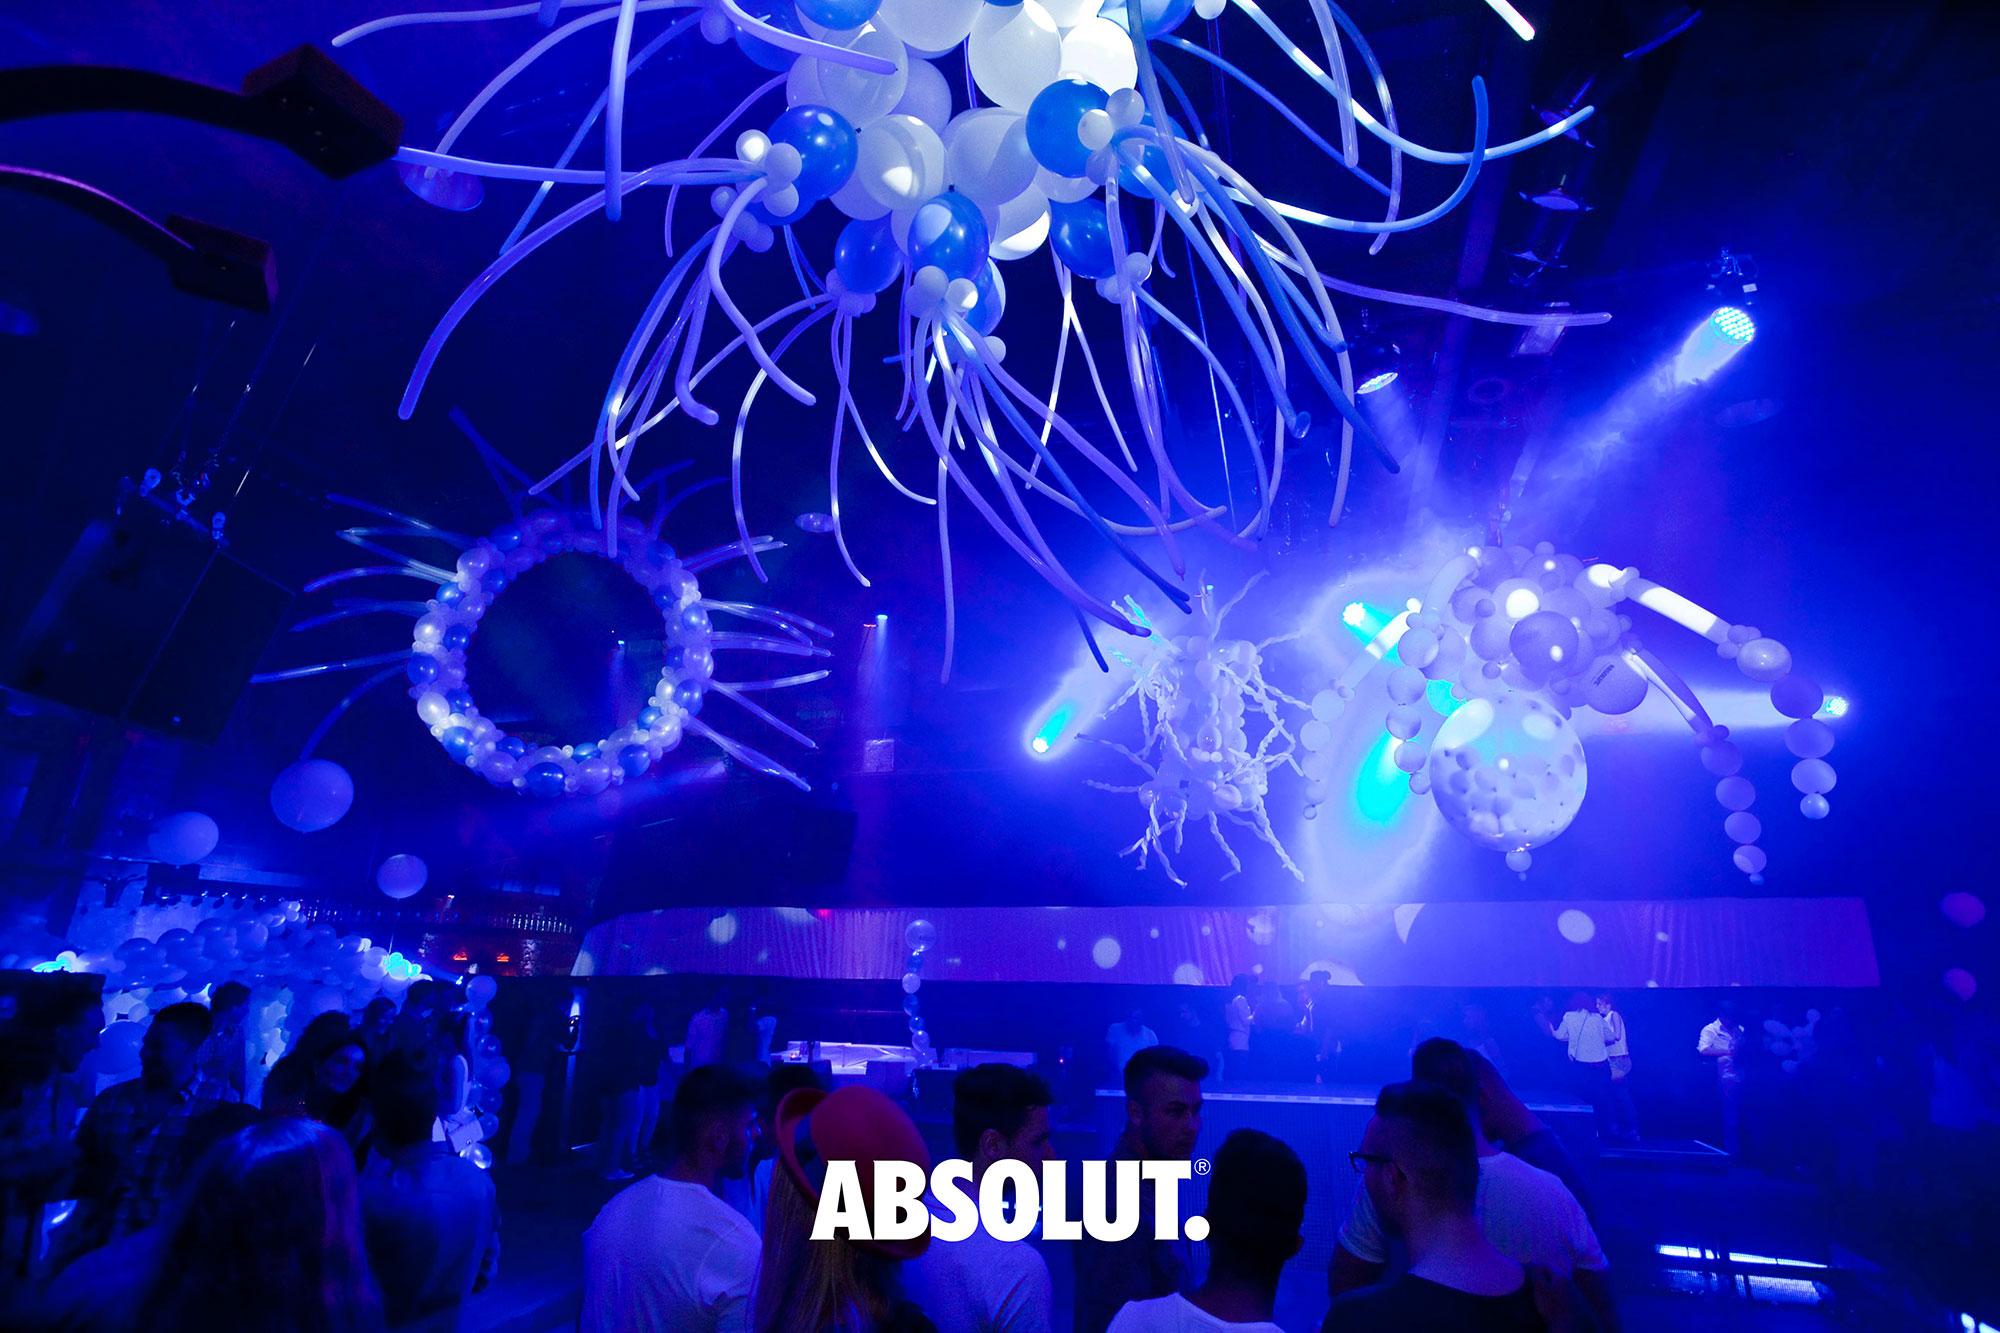 ABSOLUT Transform Today Events 2014 Balloon Art StilManipulation